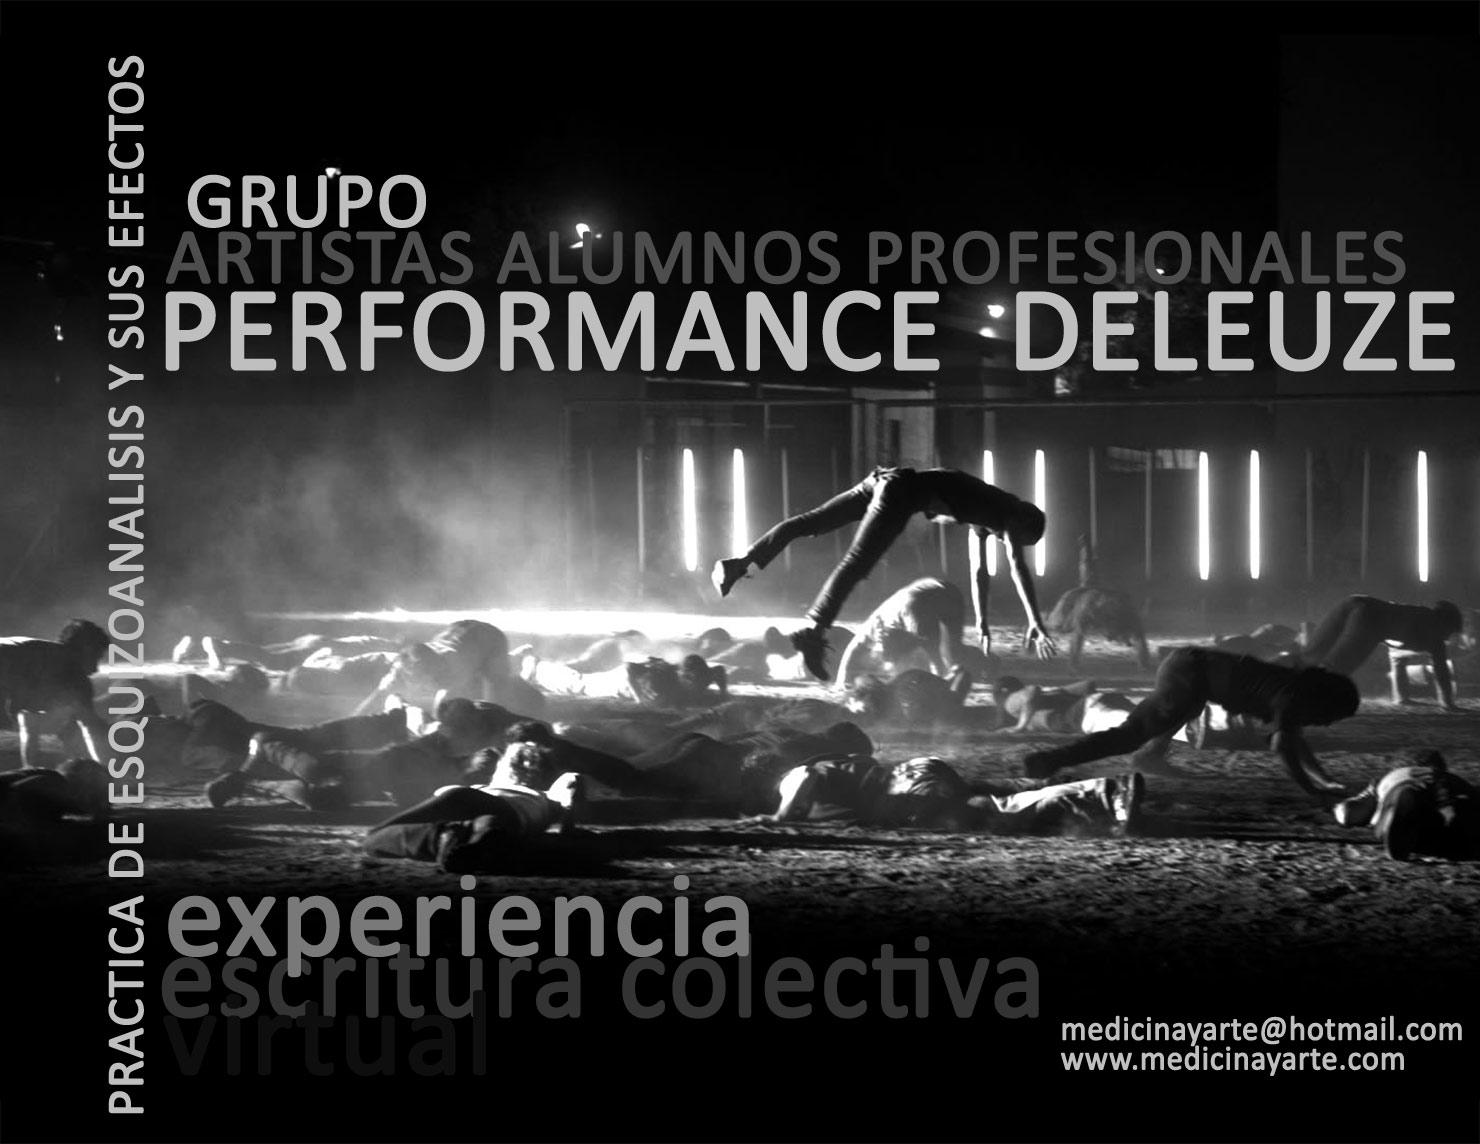 http://medicinayarte.com/img/grupo_performance_deleuze_facebook2.jpg